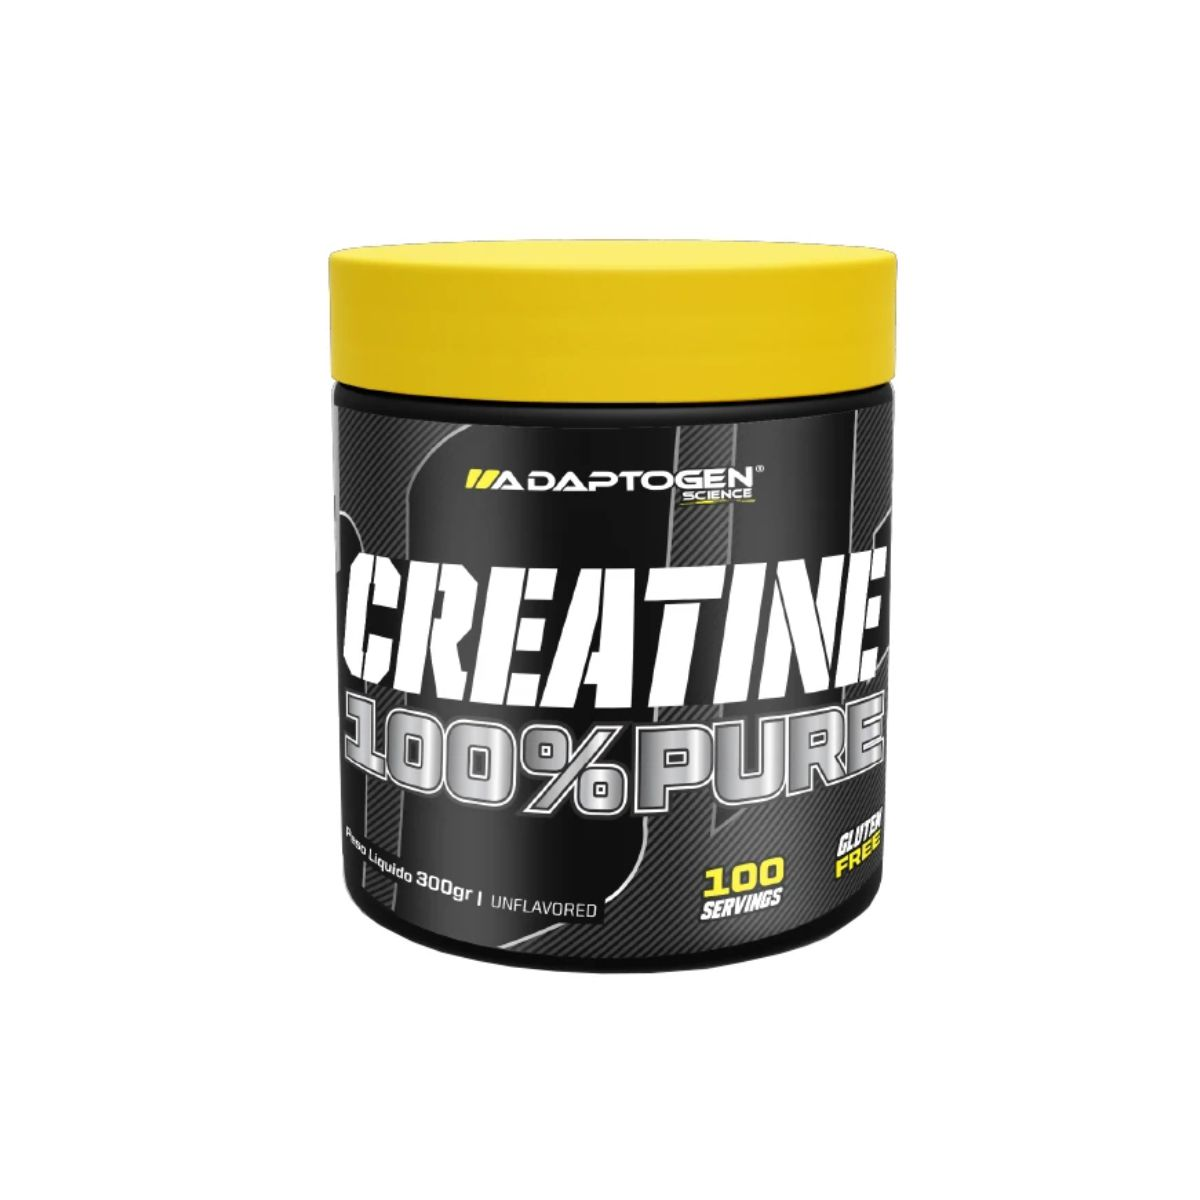 Creatina 100% Pure 300g - Adaptogen